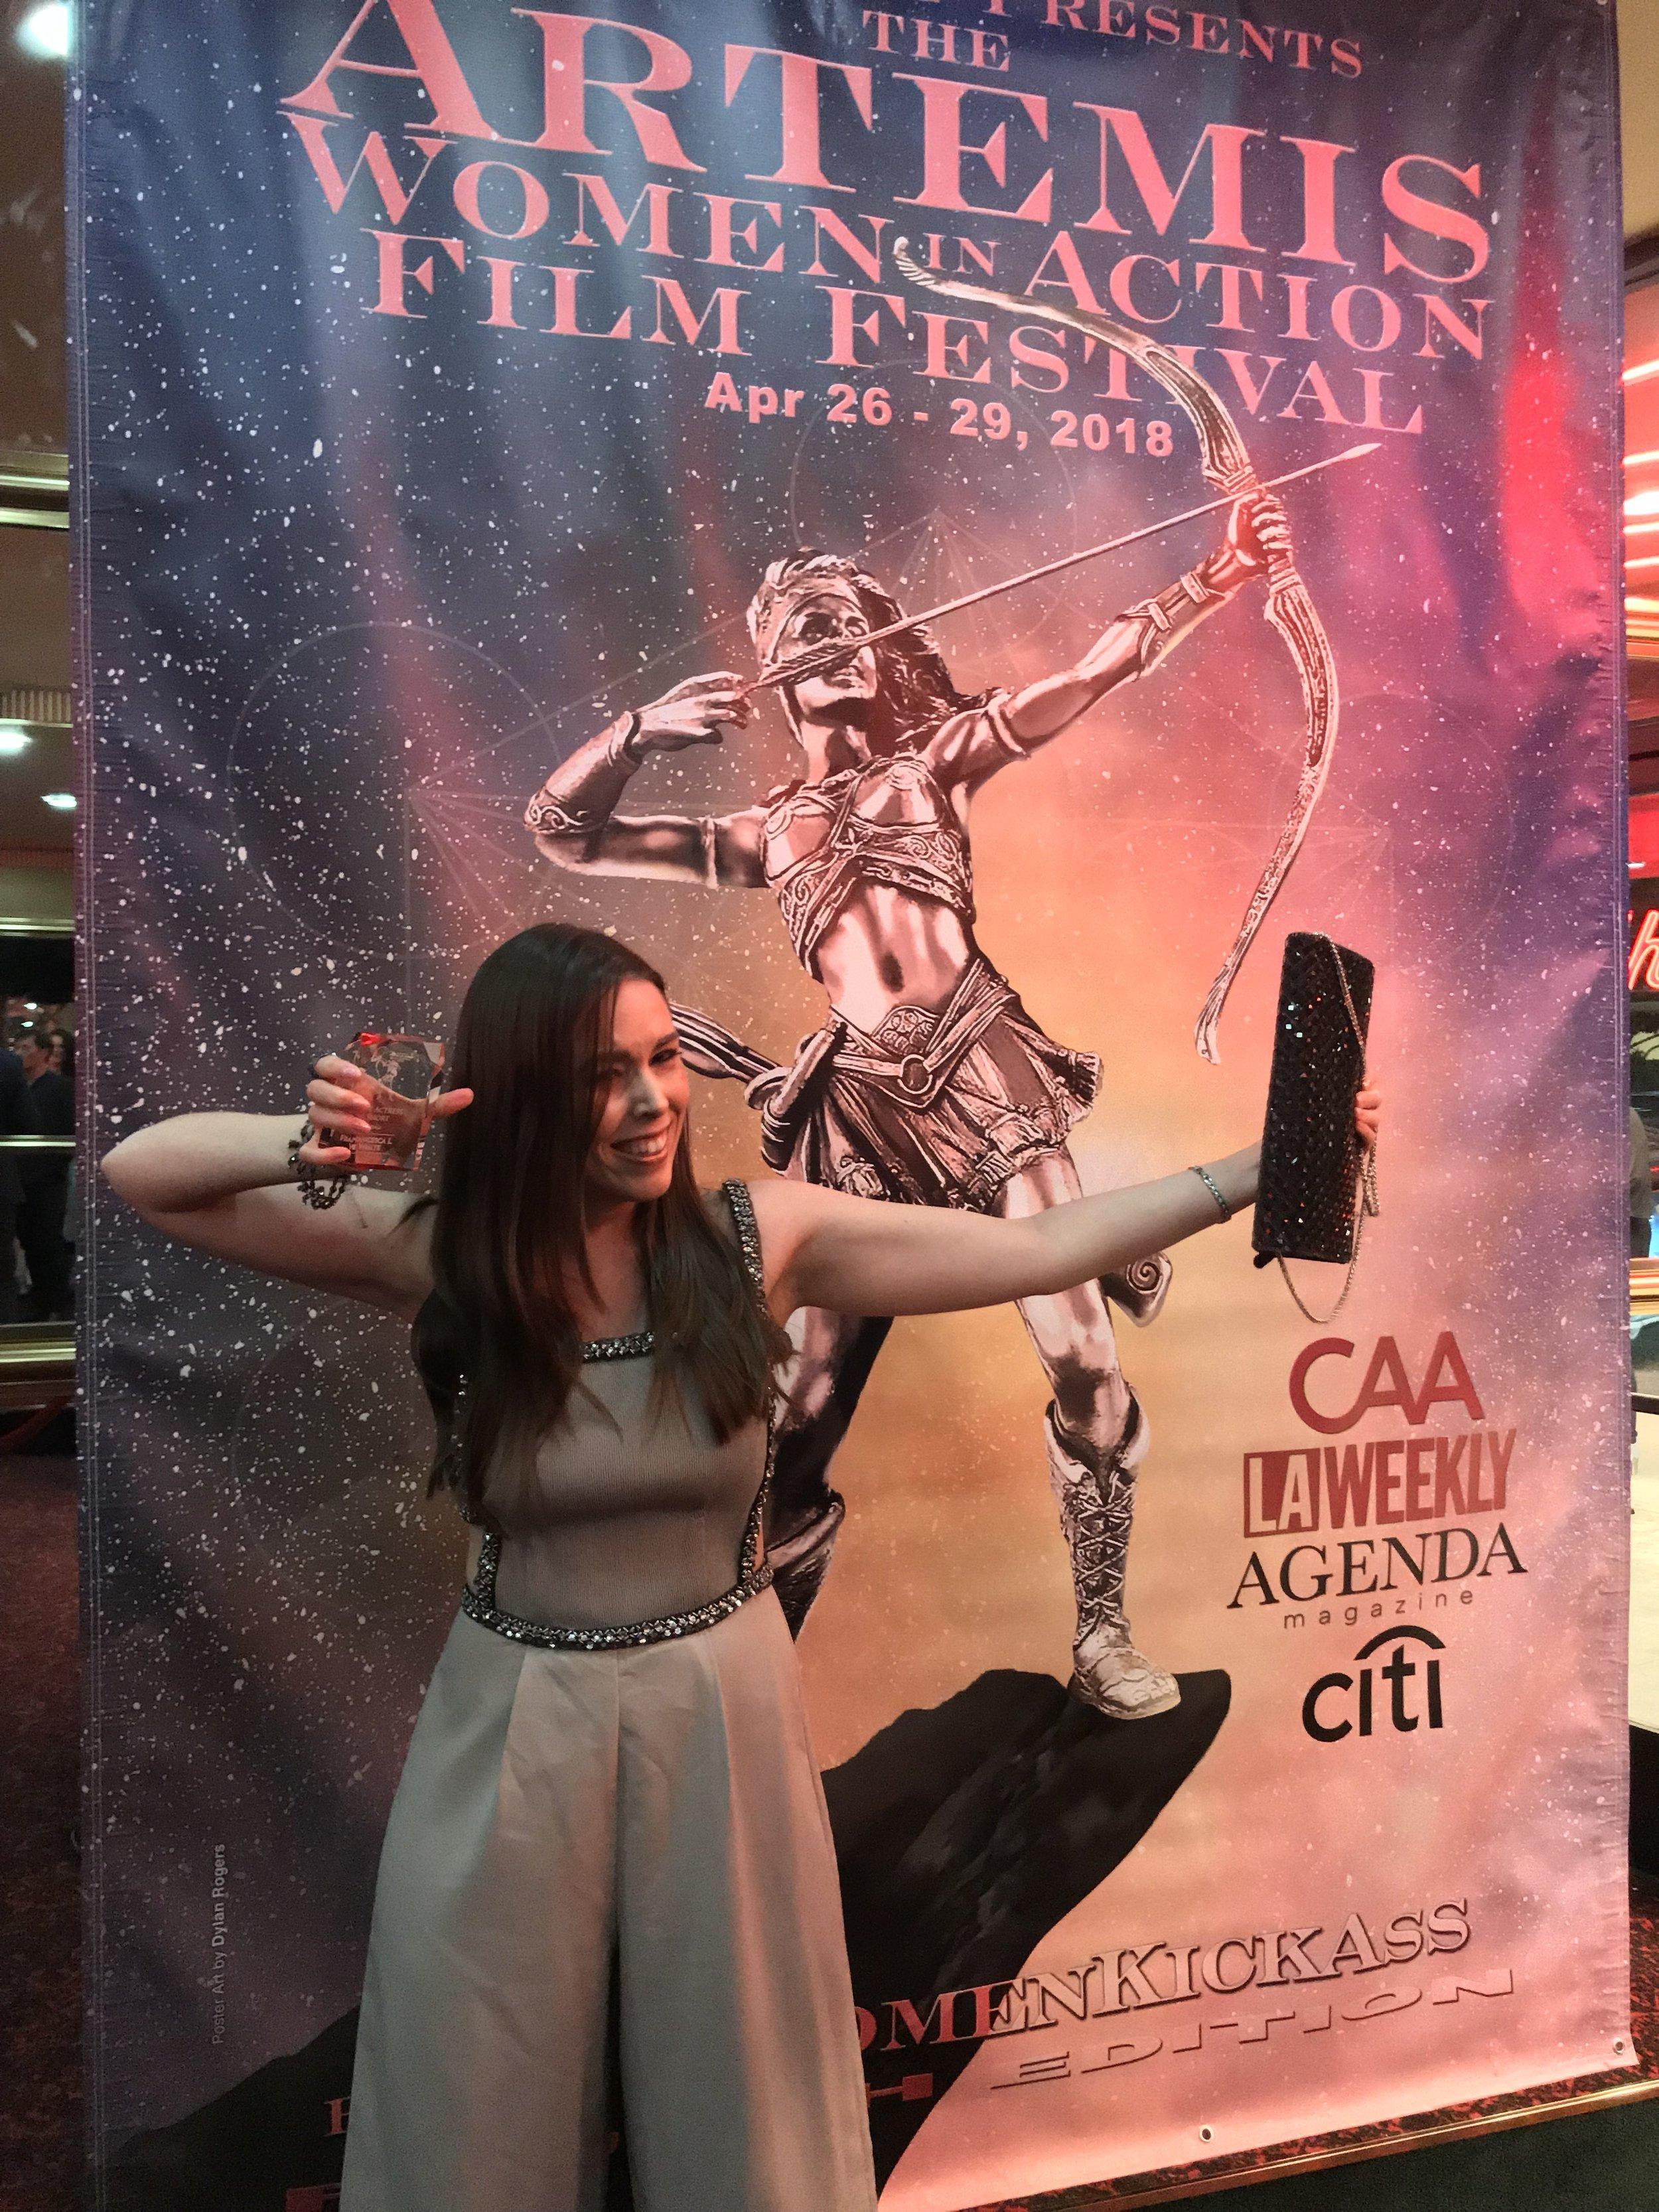 Artemis 'Women In Action' Film Festival, Beverly Hills April 2018